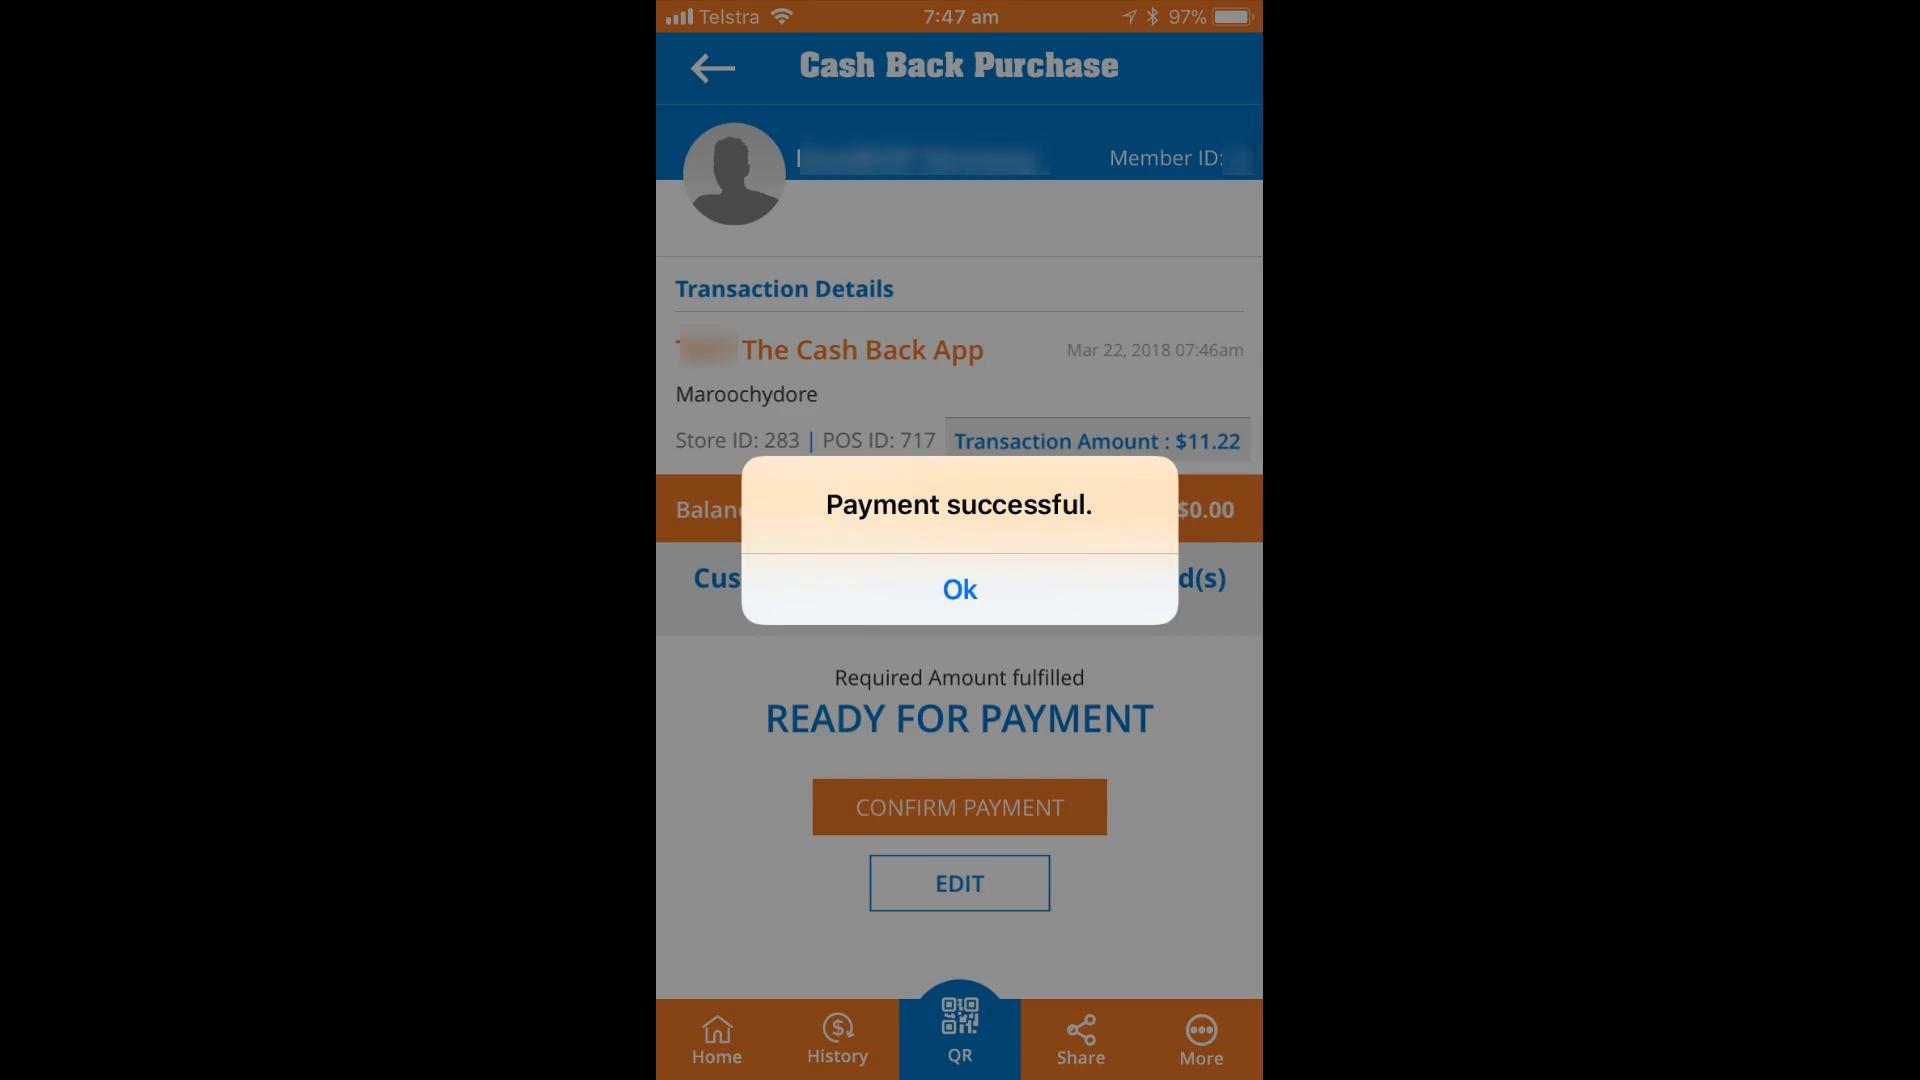 Getting Cash Back at Merchants